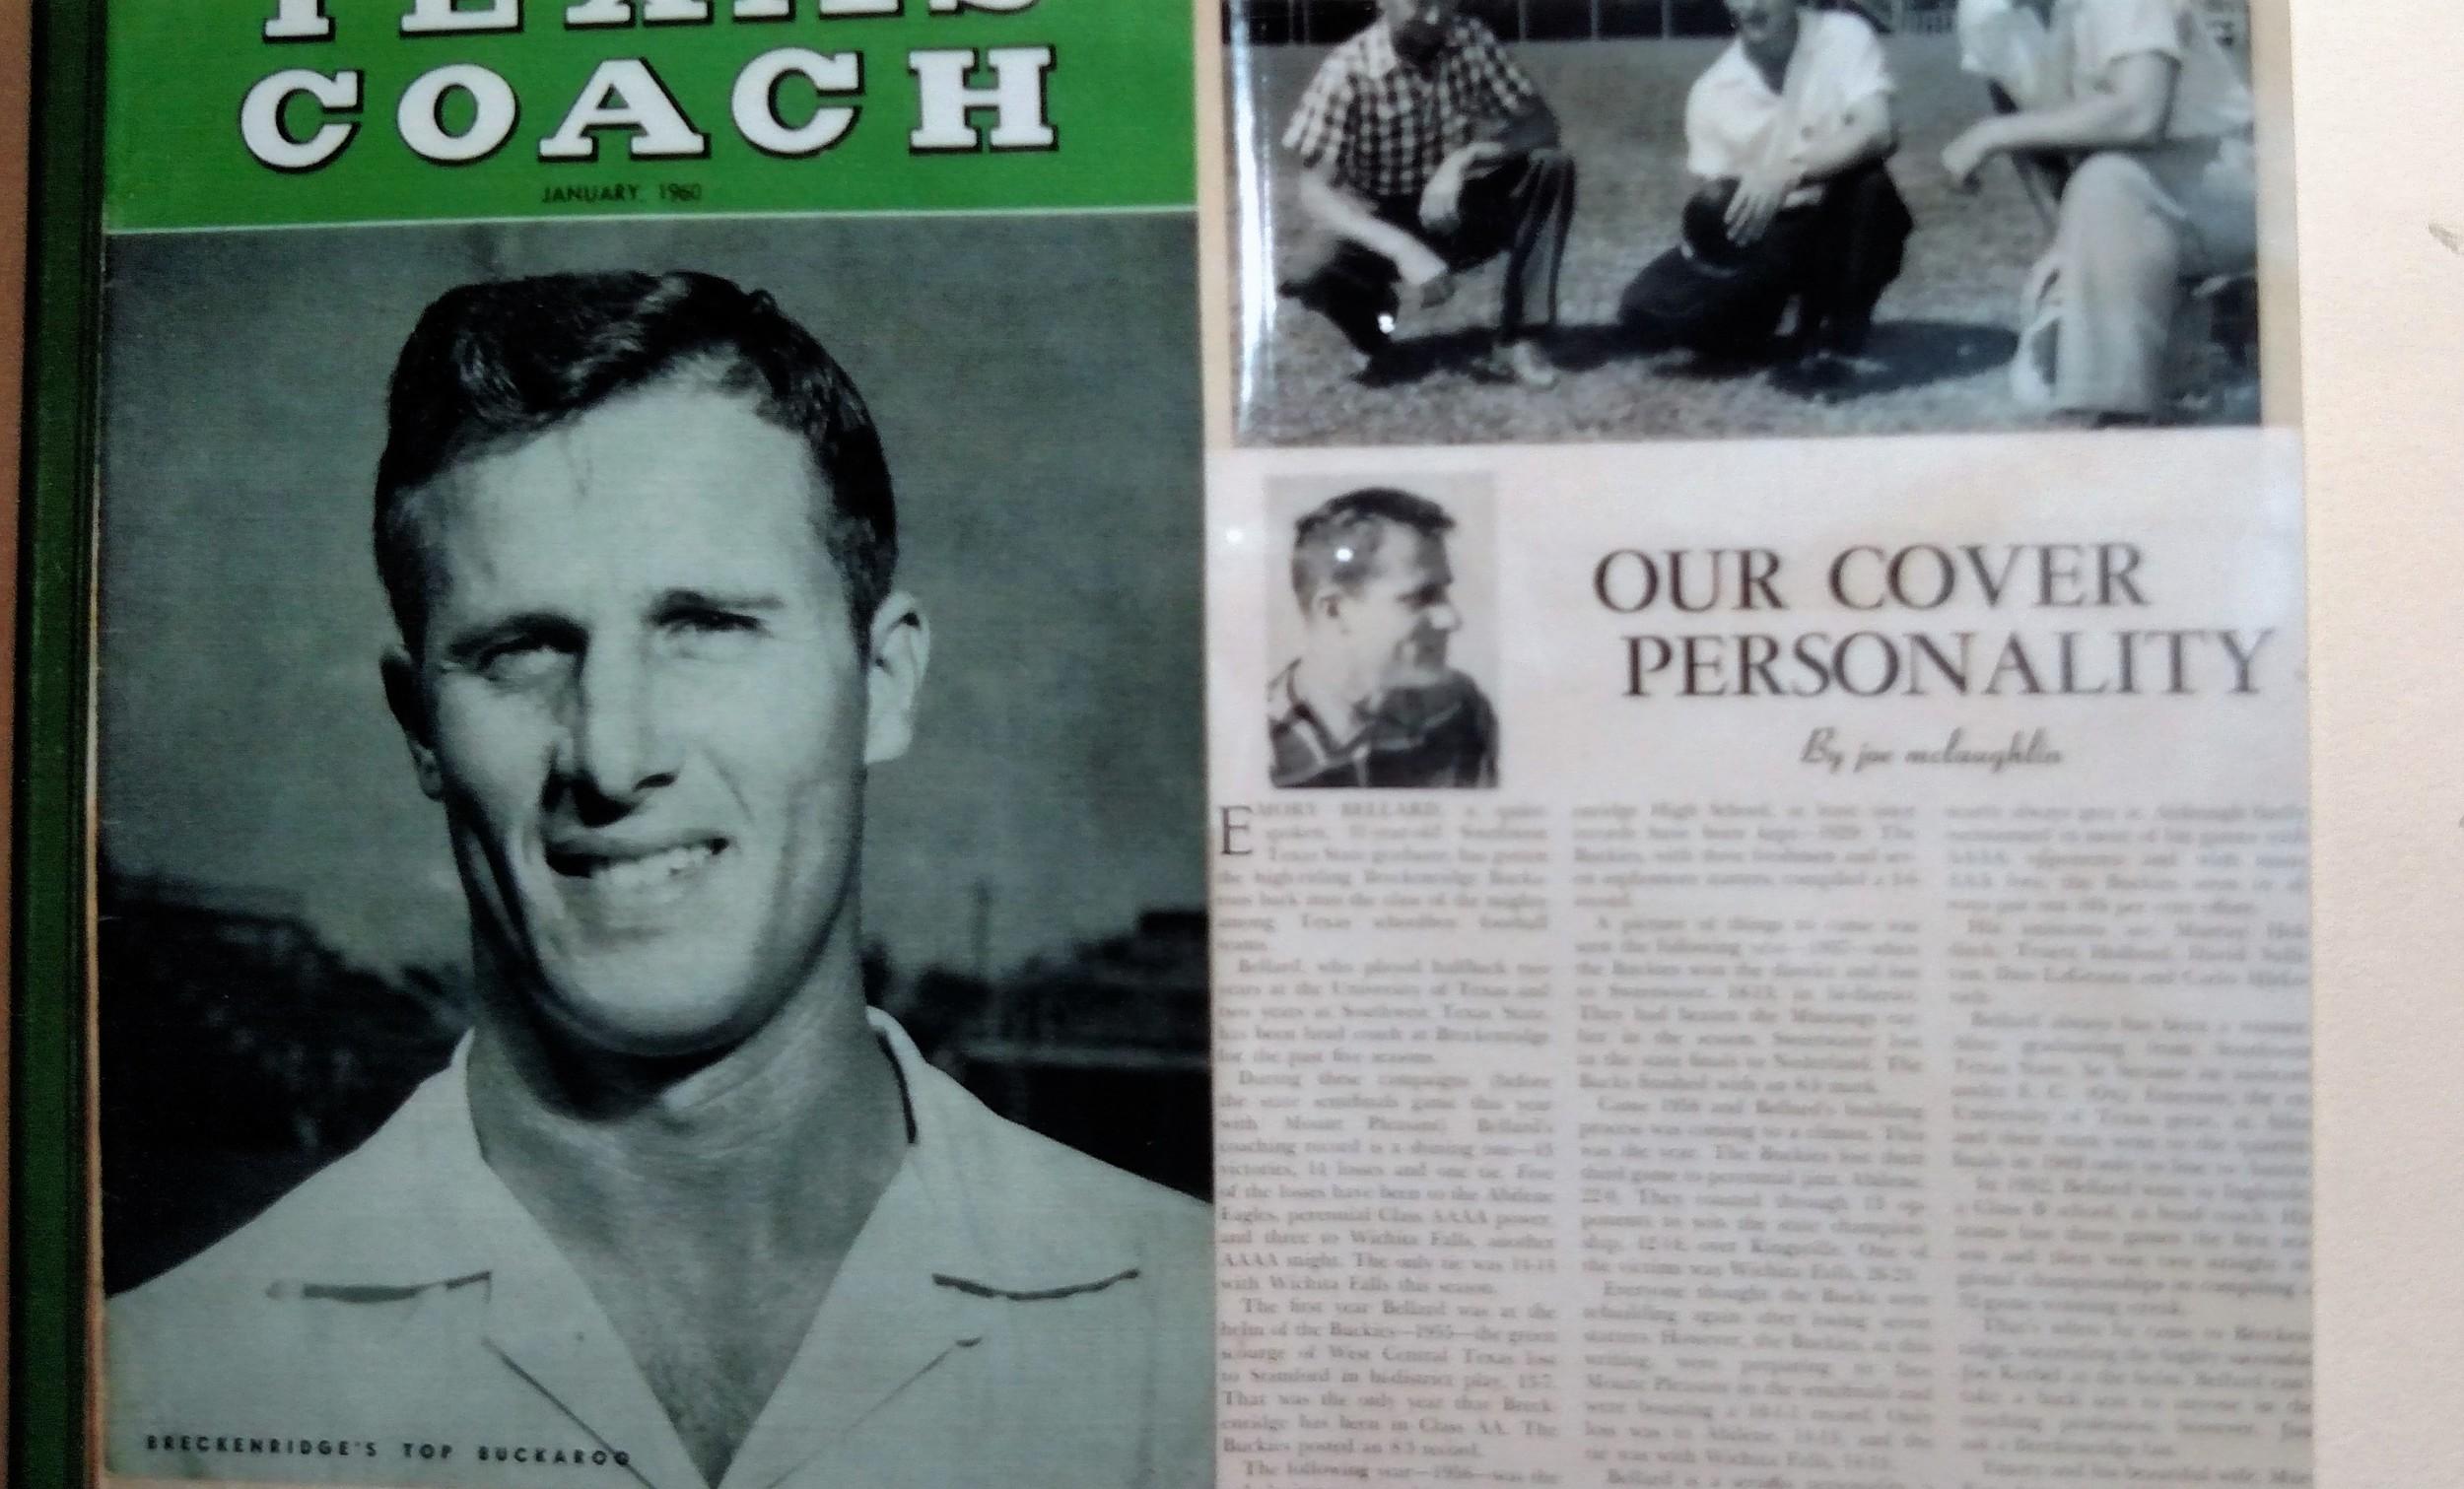 Coach Bellard as a high school coach